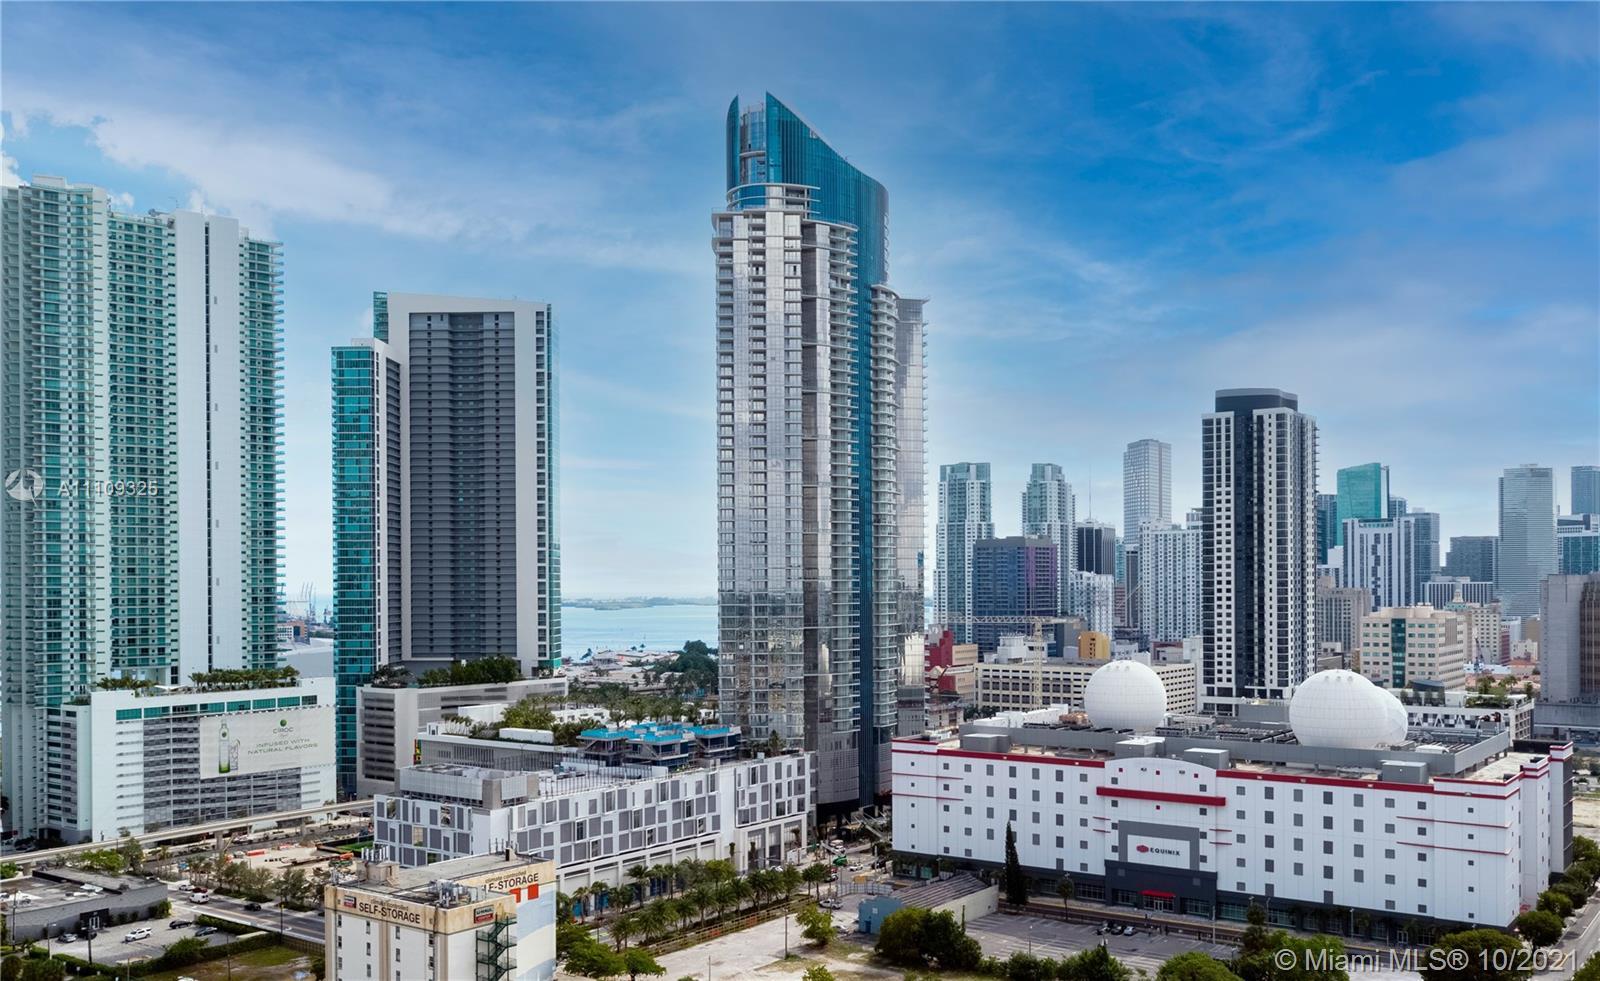 Paramount Miami Worldcenter #3601 - 851 NE 1st Ave #3601, Miami, FL 33132